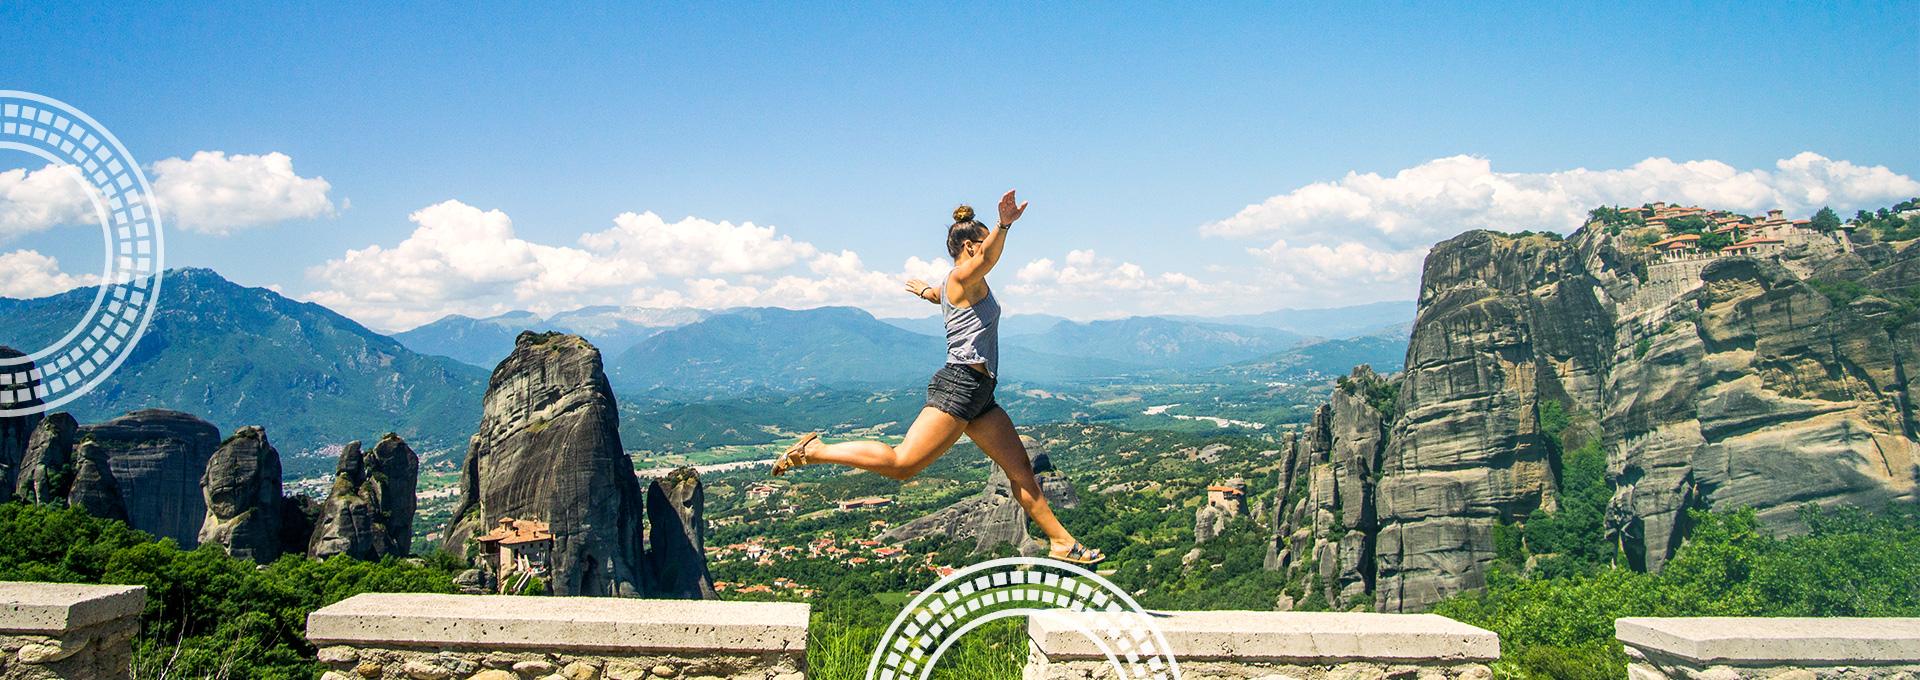 Excursion to Meteora from Thessaloniki | Ammon Express